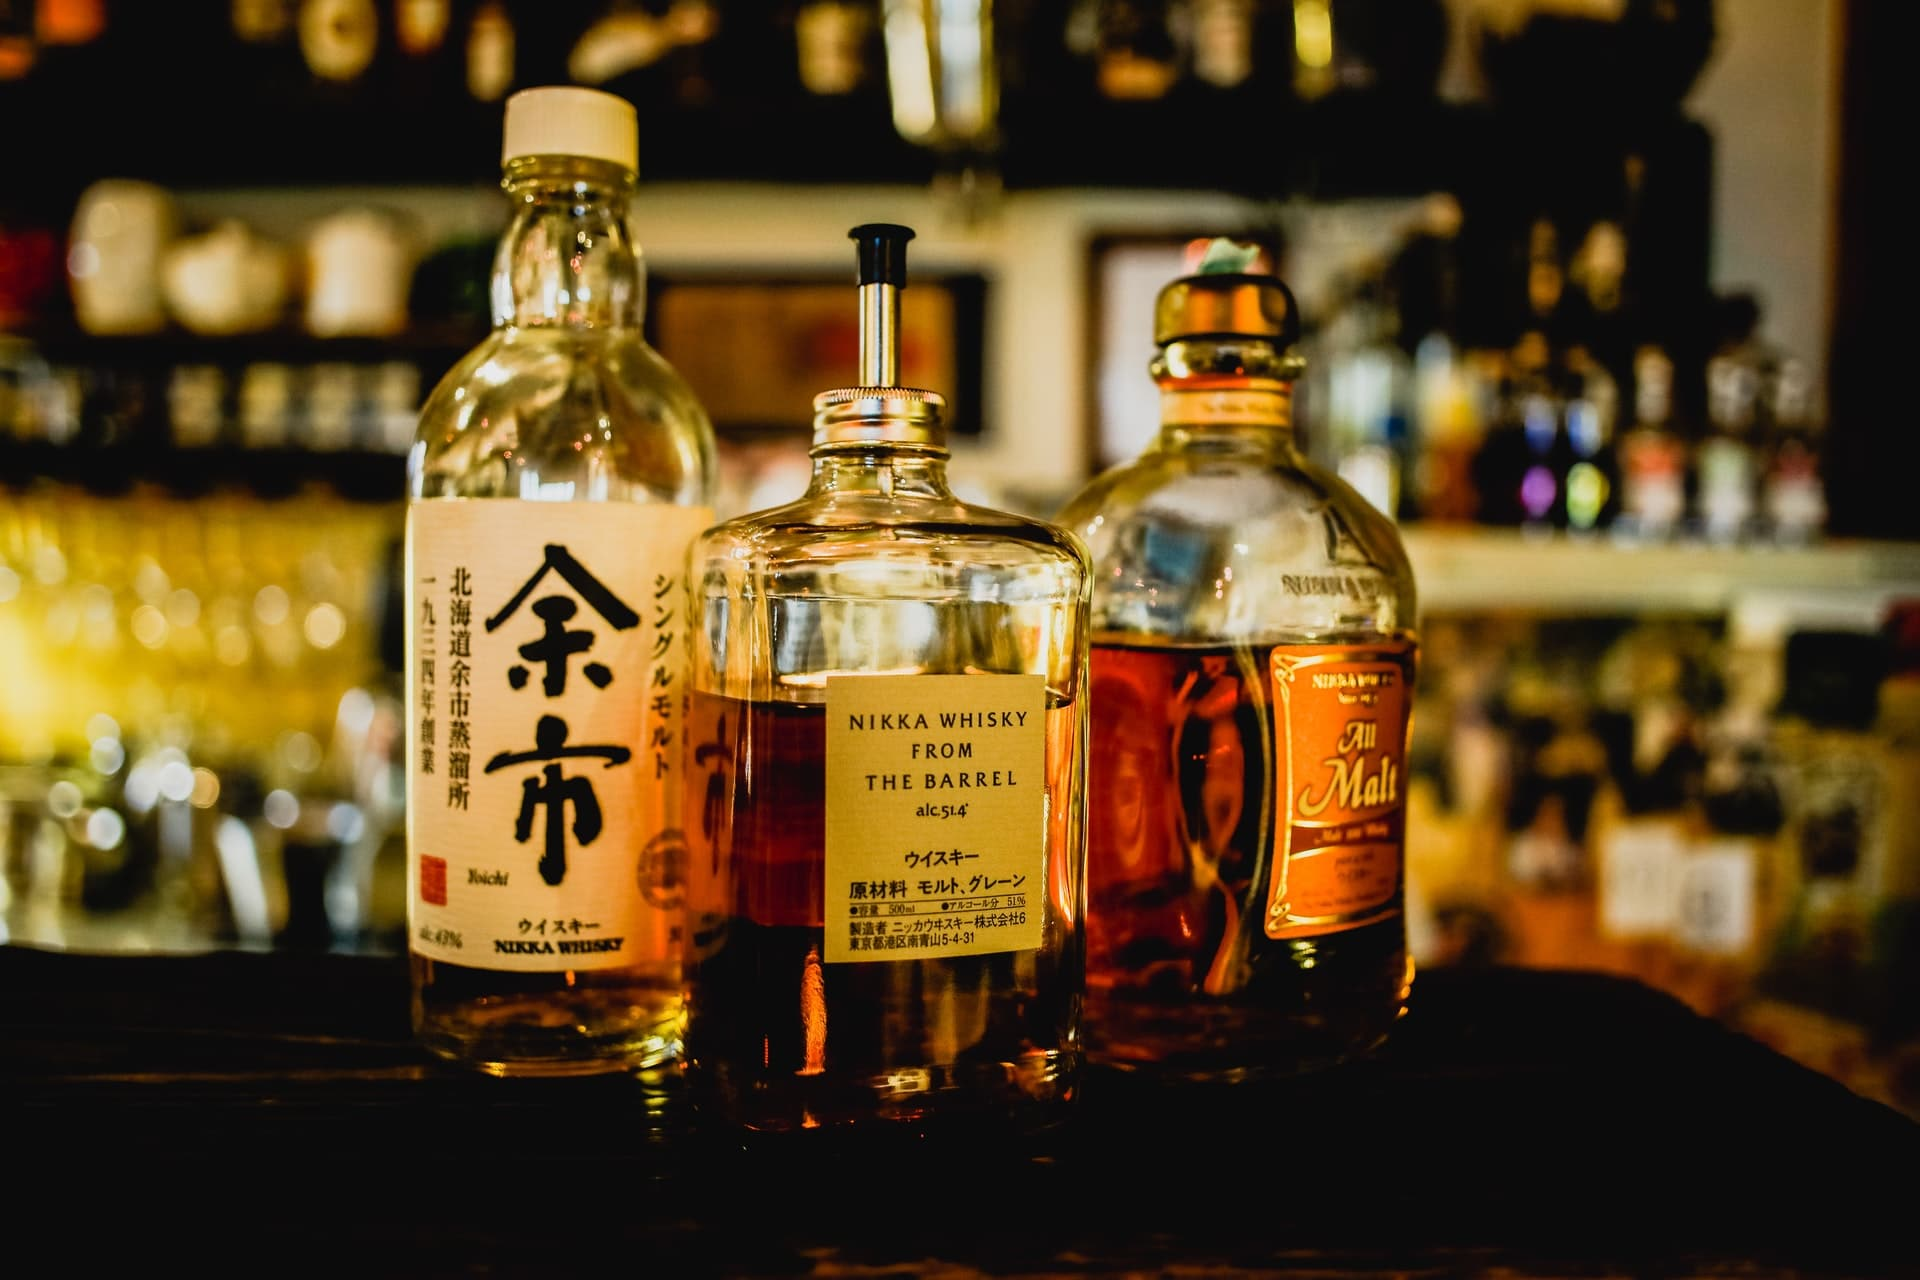 The distilled spirits market beyond 2021: Trends, profit margins & more featured image